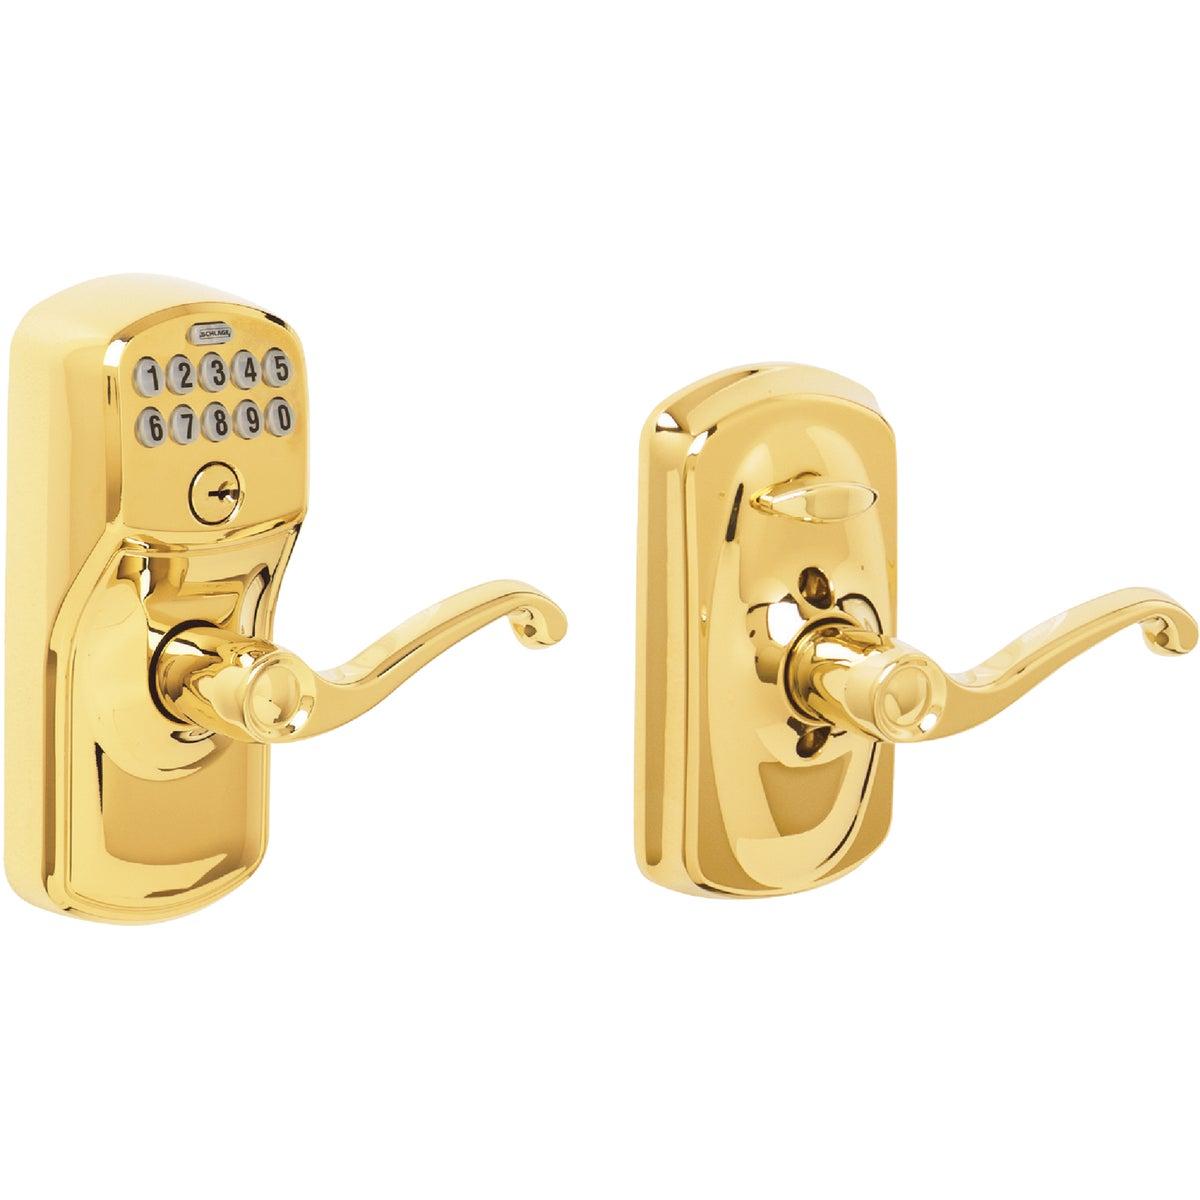 ELECTRONIC ENTRY KEYPAD - FE595VPLYXFLA505 by Schlage Lock Co